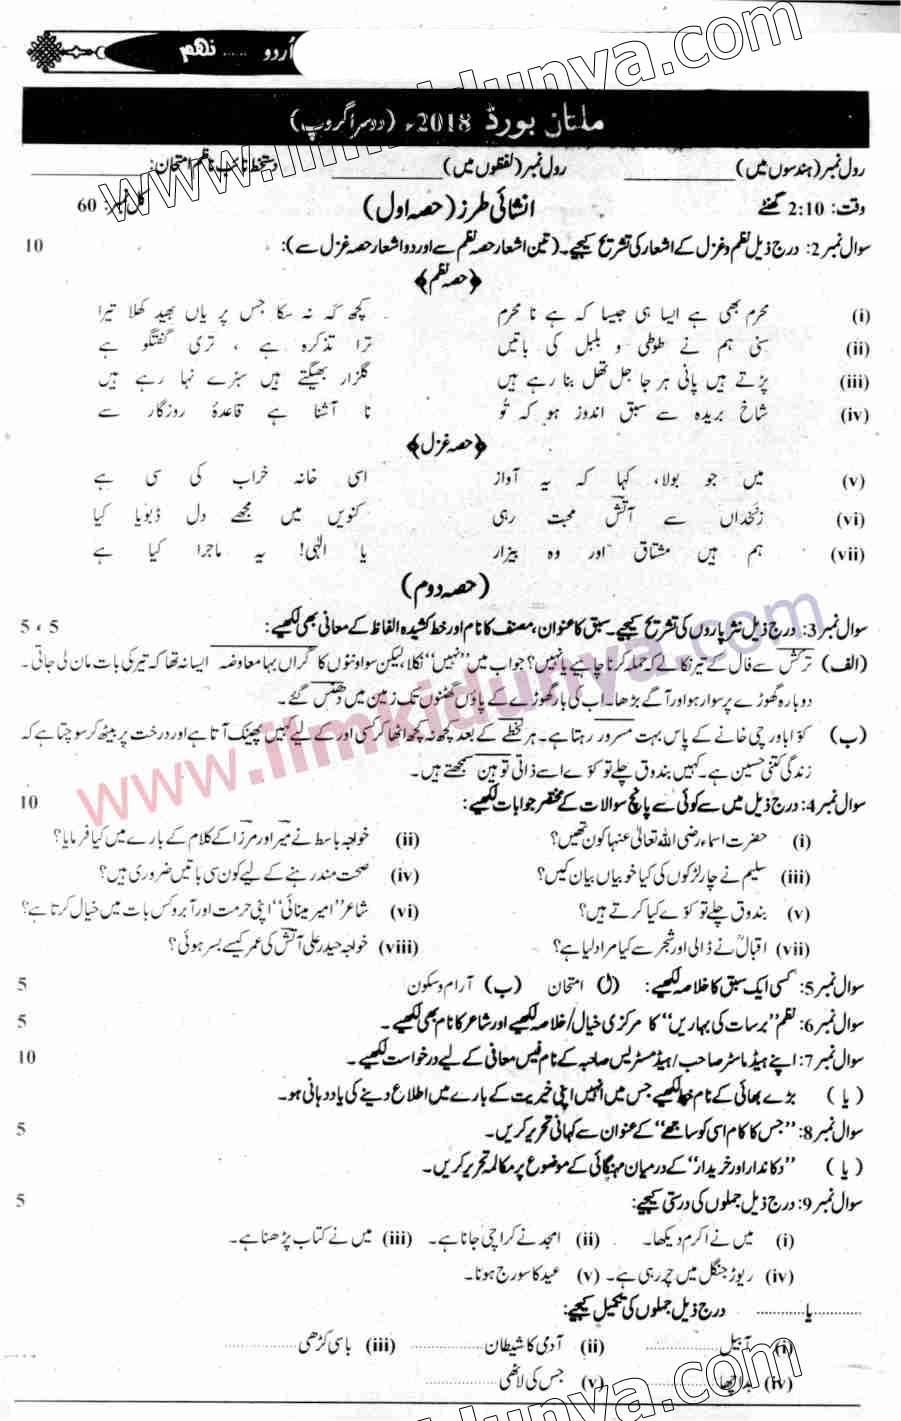 Past Papers 2018 Multan Board 9th Class Urdu Group 2